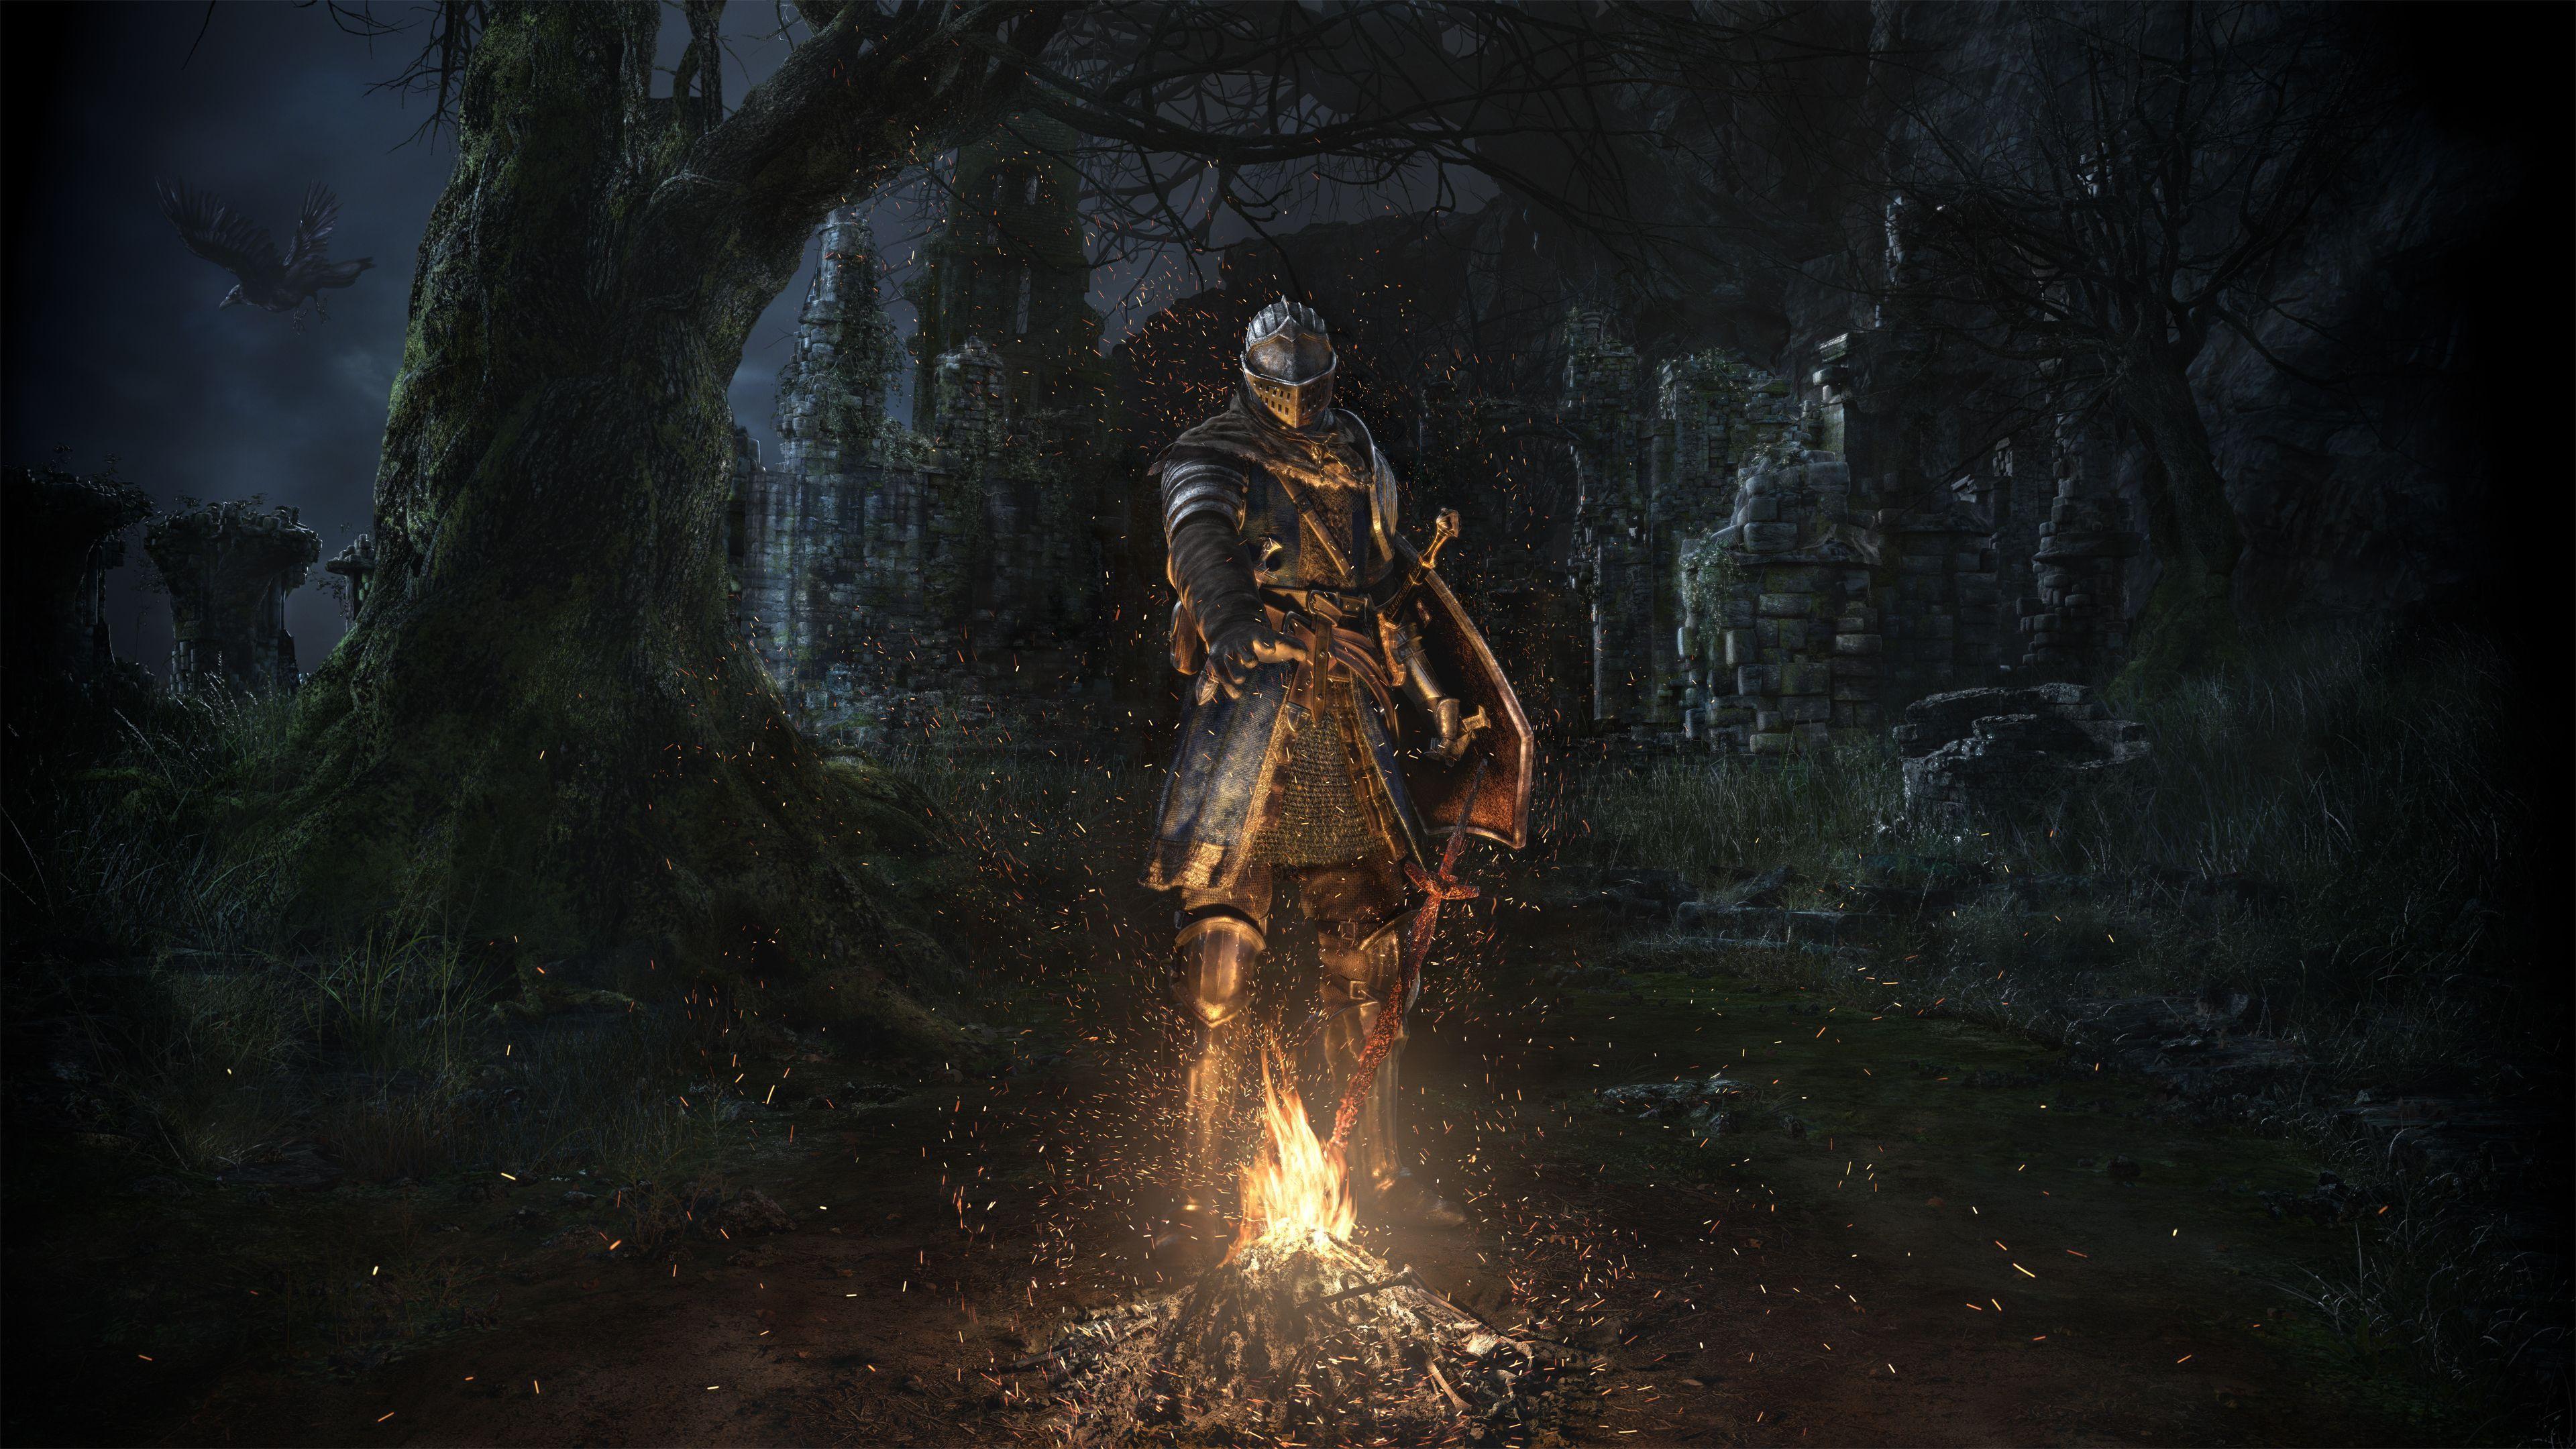 Dark Souls Remastered Wallpapers - Top Free Dark Souls Remastered  Backgrounds - WallpaperAccess